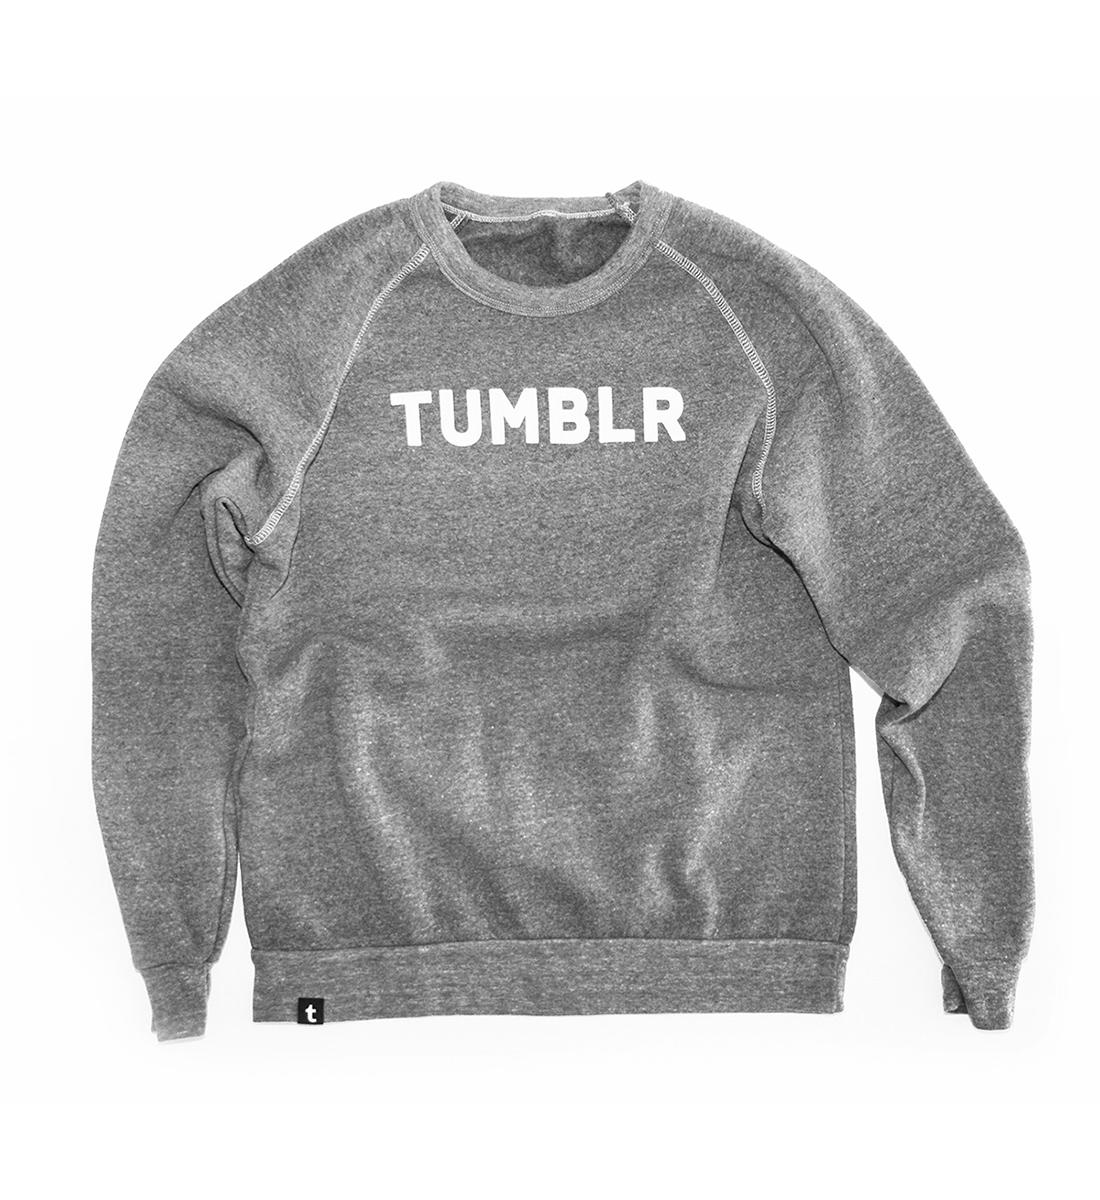 Tumblr Varsity Crew Sweatshirt